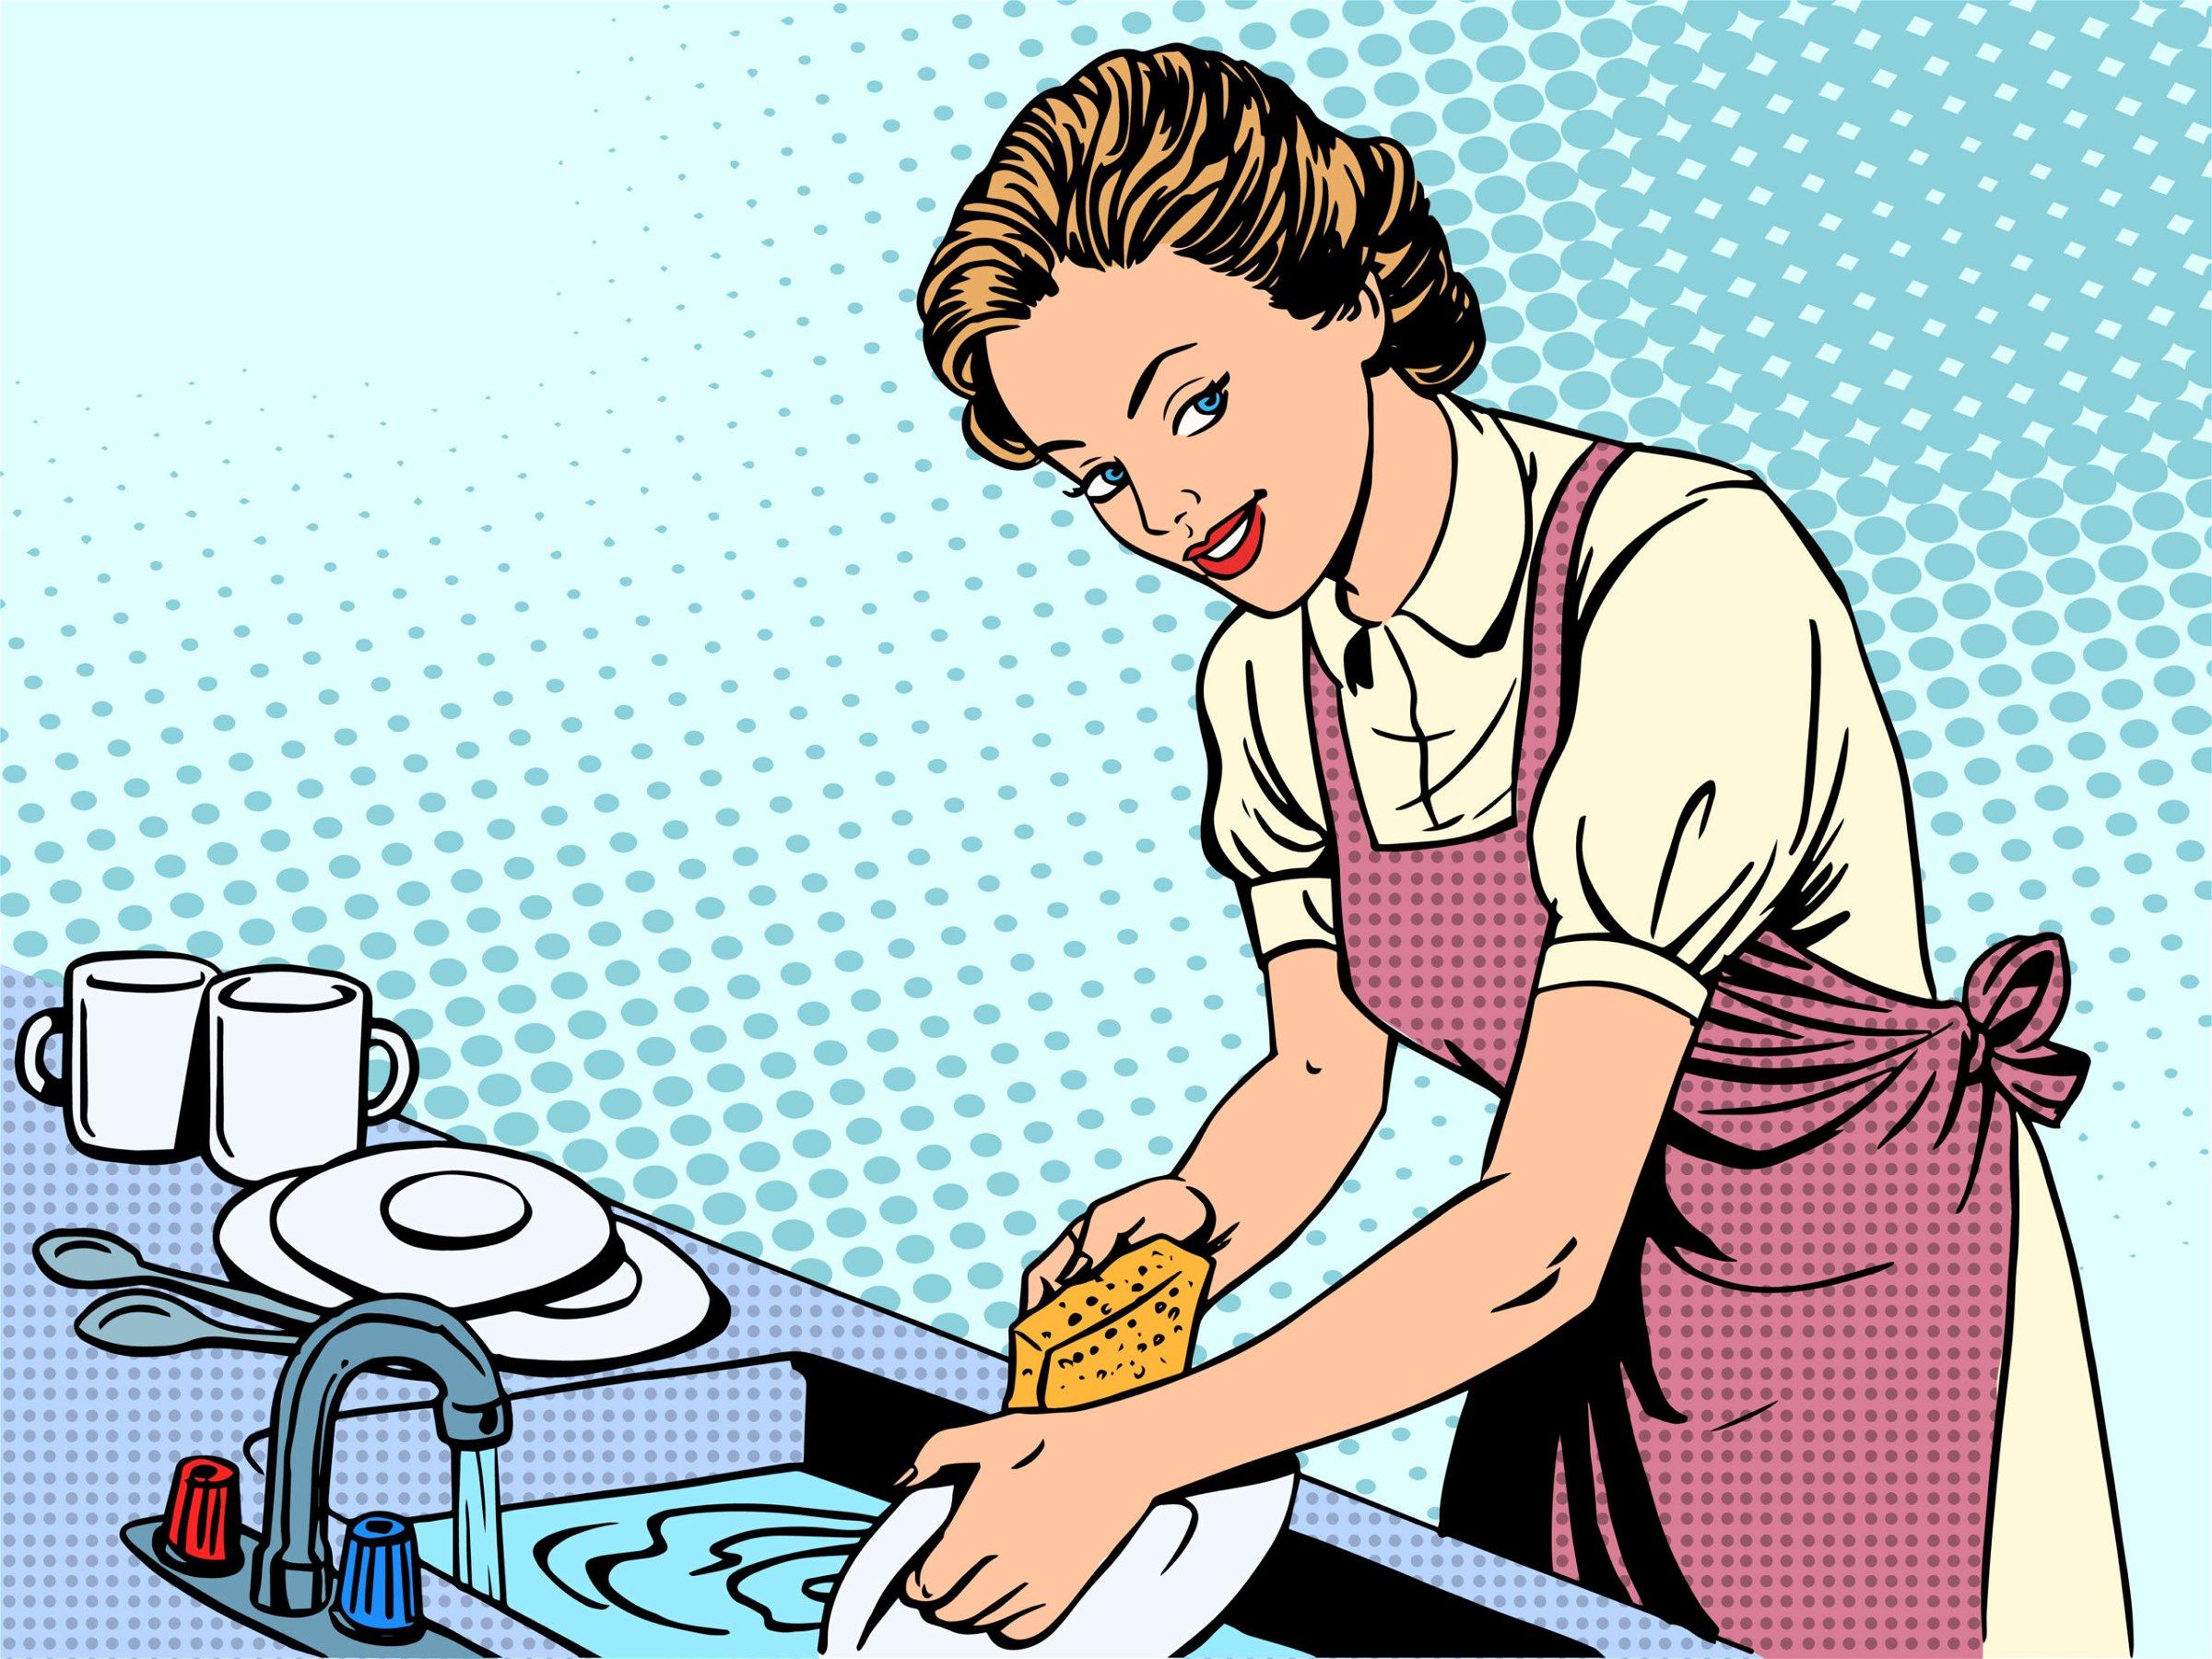 Trump Tells Women to Buy Dishwashers